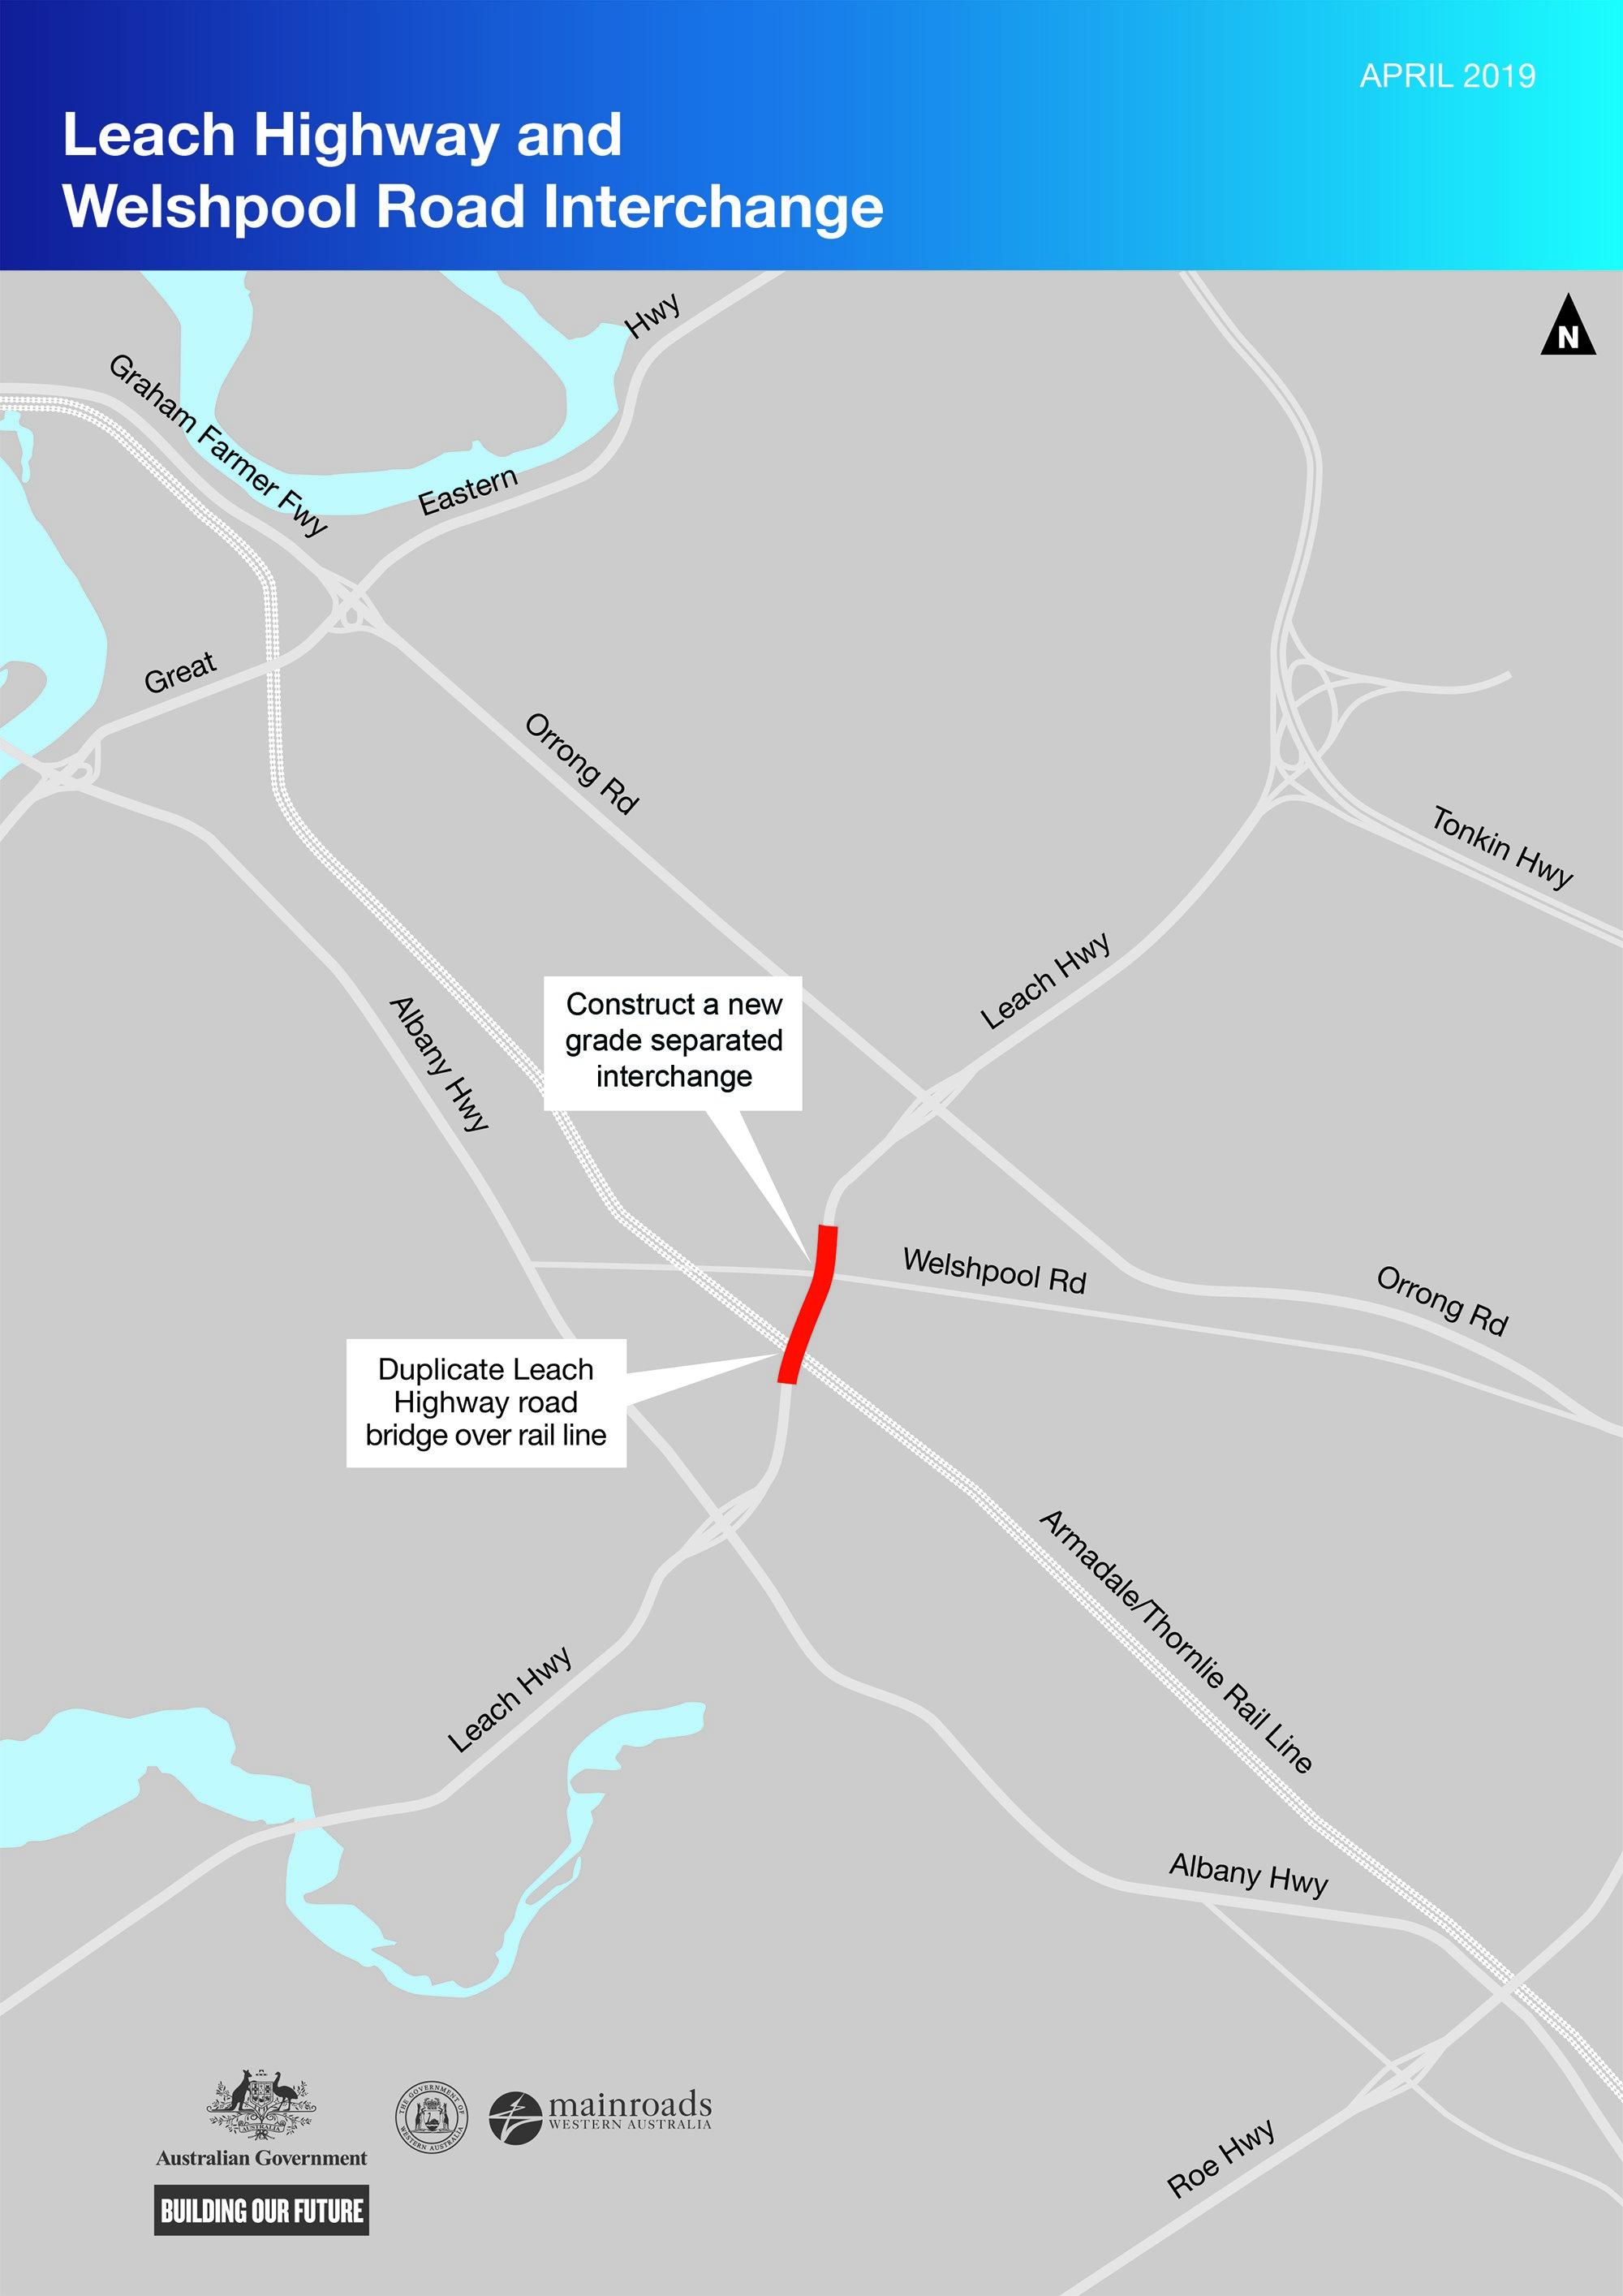 Leach Hwy and Welshpool Rd map